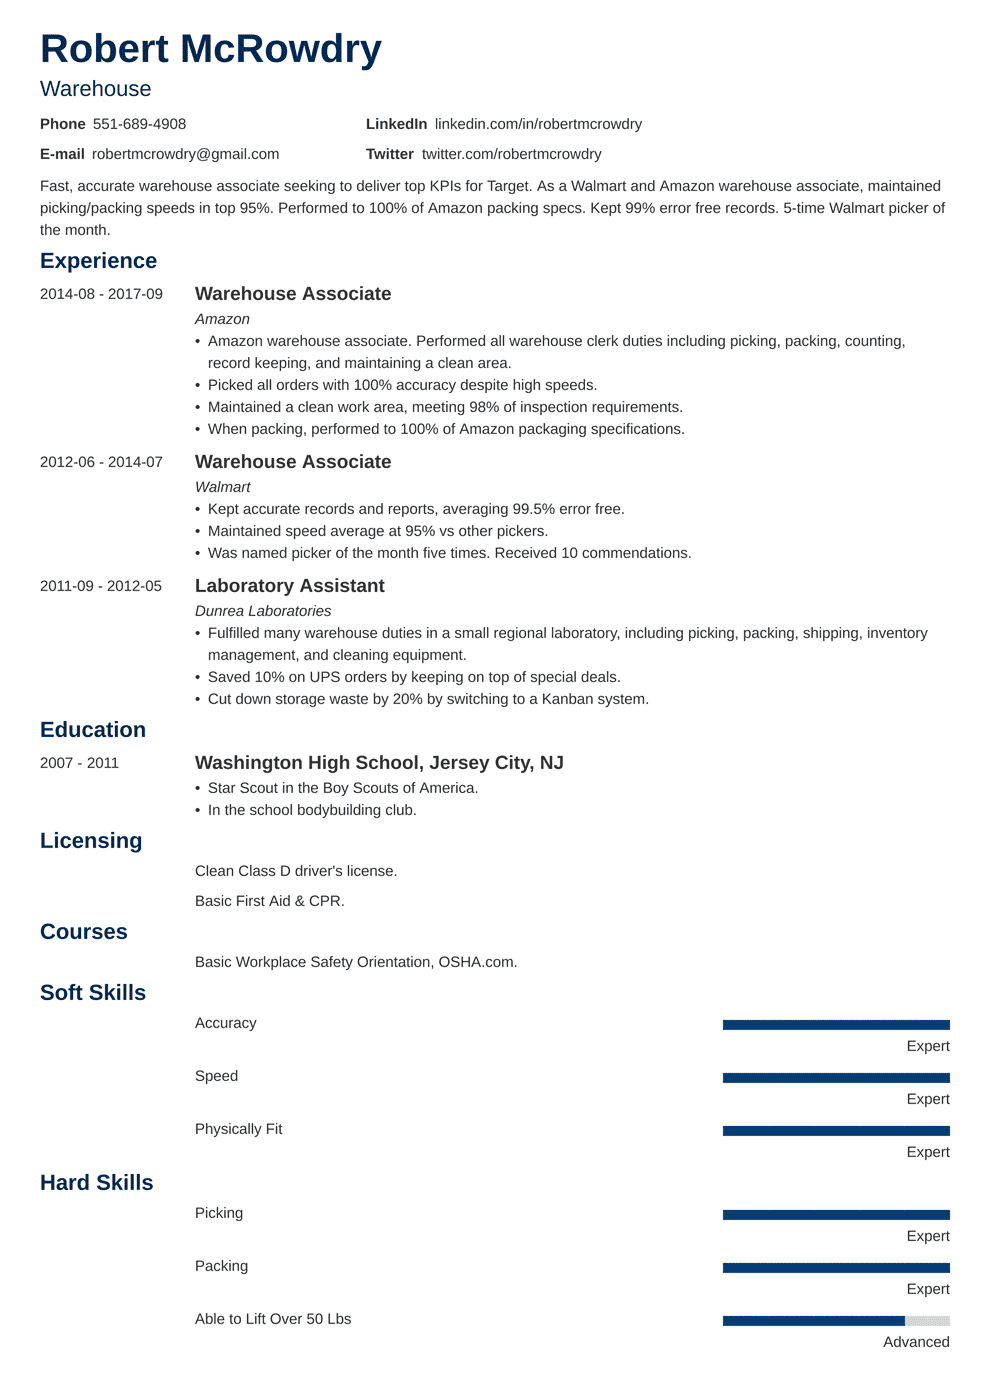 Warehouse Worker / Associate Resume Sample & Guide